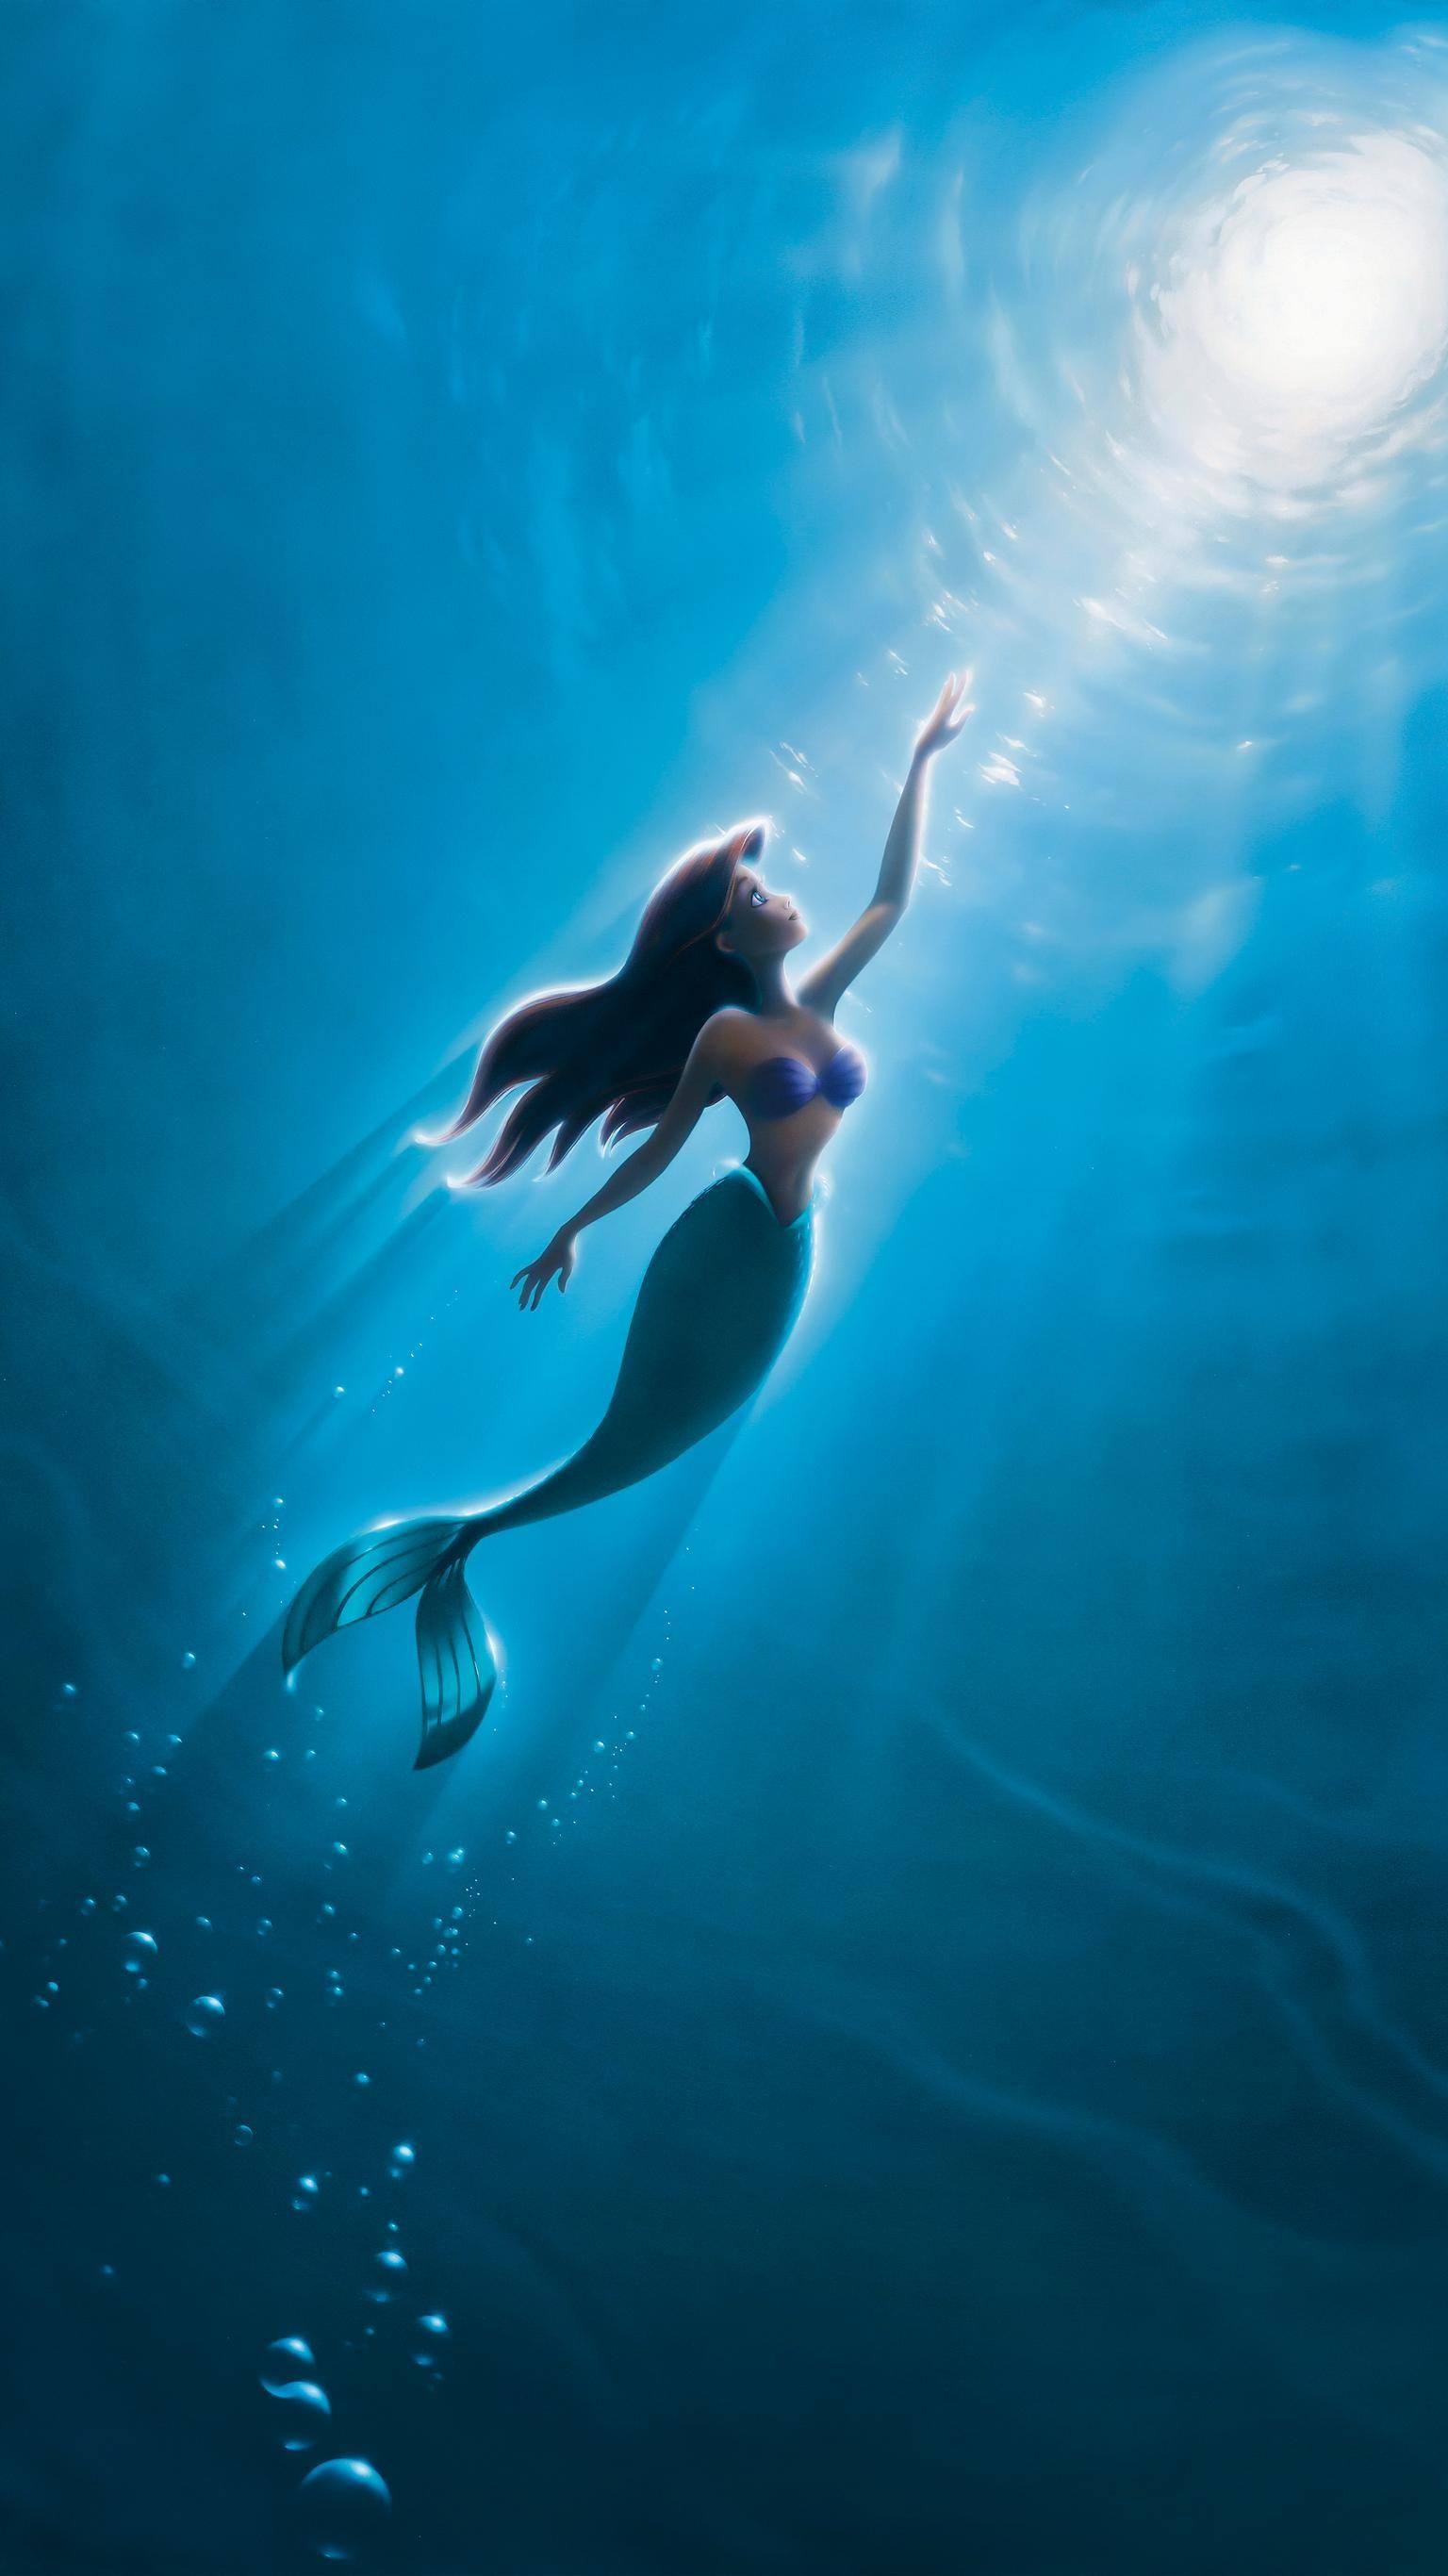 The Little Mermaid (1989) Phone Wallpaper | Moviemania #mermaid